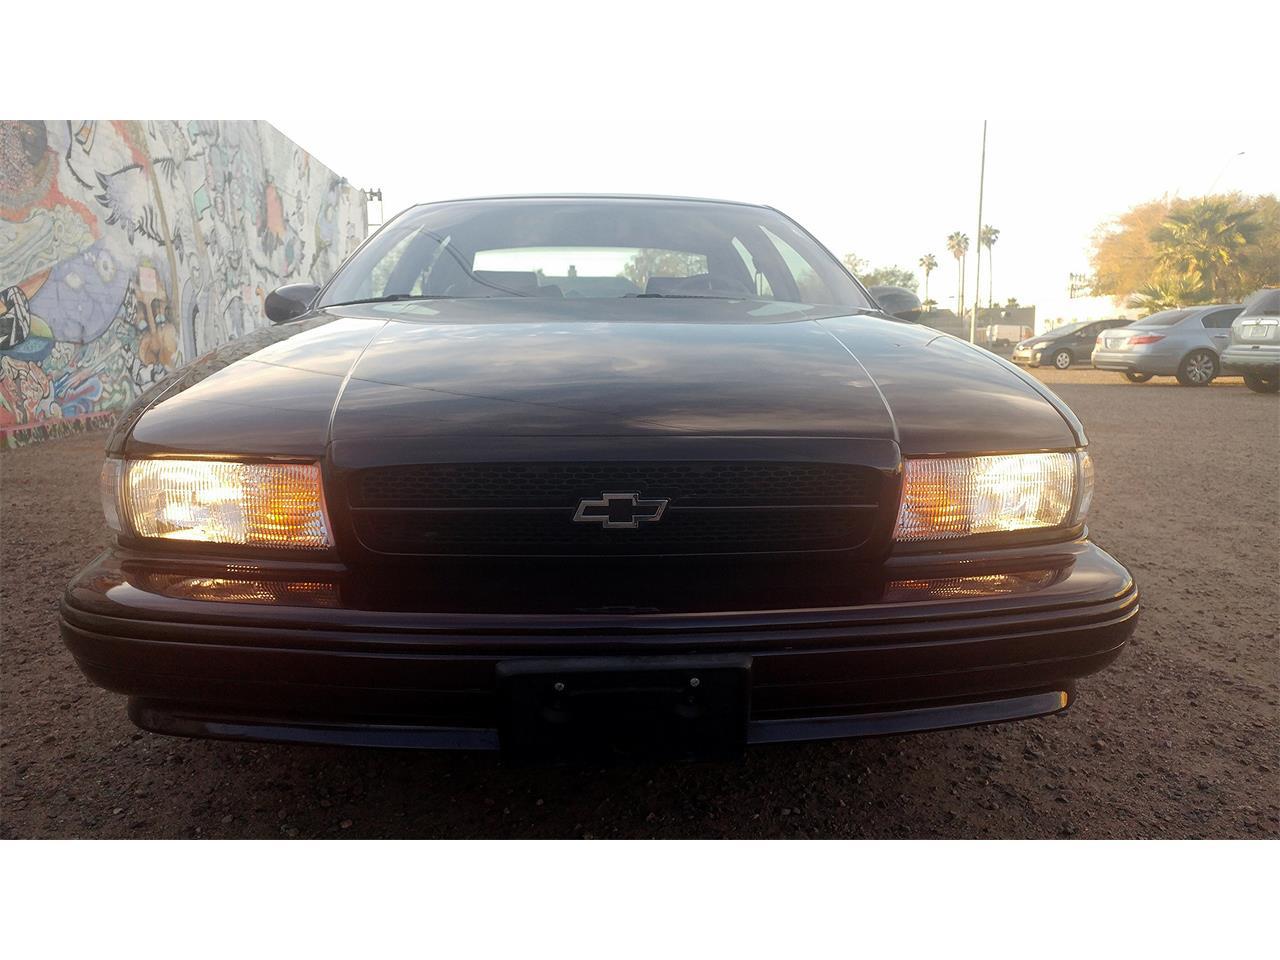 1996 Chevrolet Impala SS (CC-1308641) for sale in Phoenix, Arizona